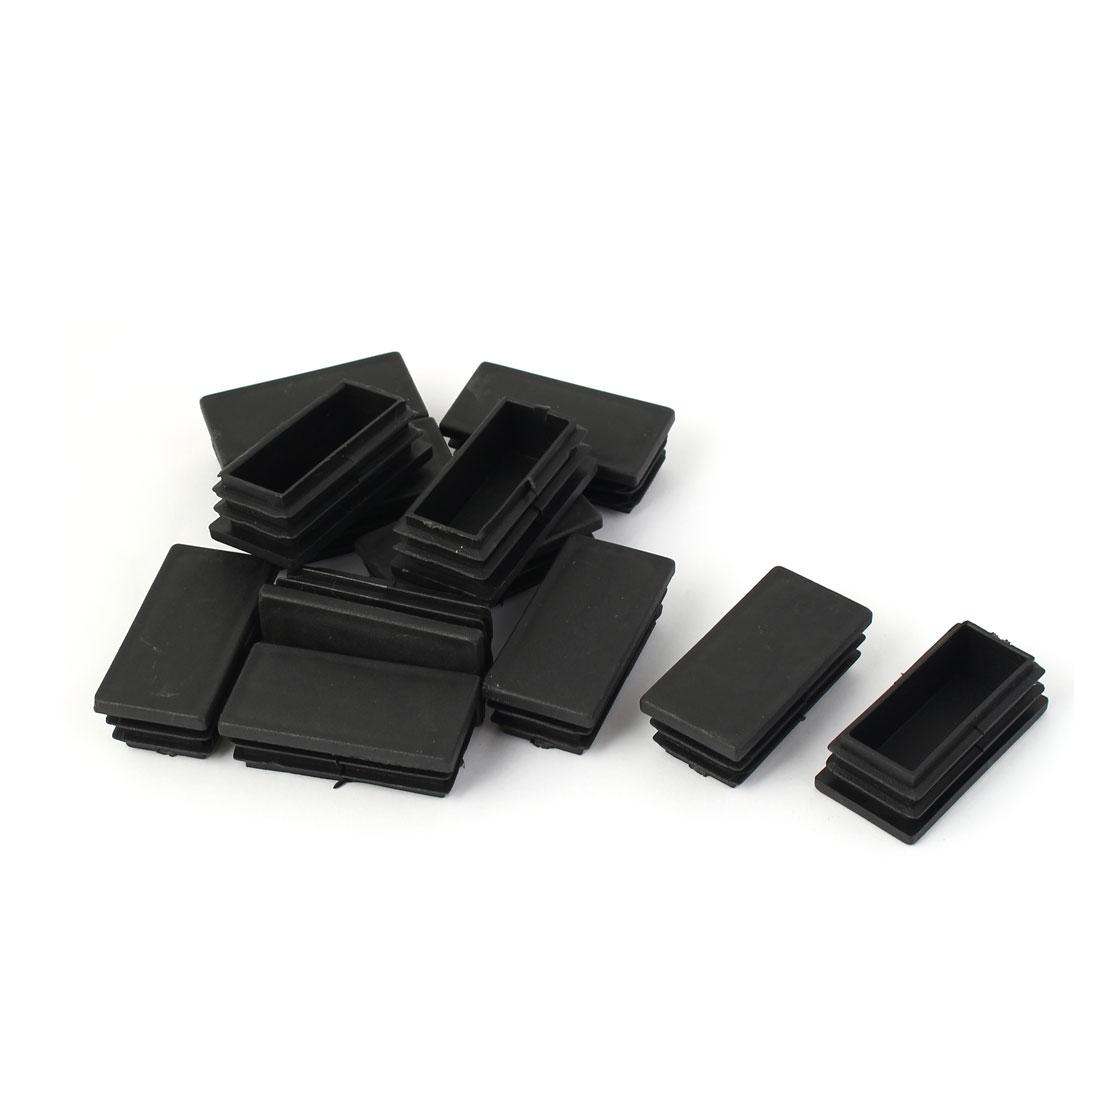 50mm x 25mm Plastic Square Table Chair Leg Feet Tube Pipe Insert Cap Black 12pcs